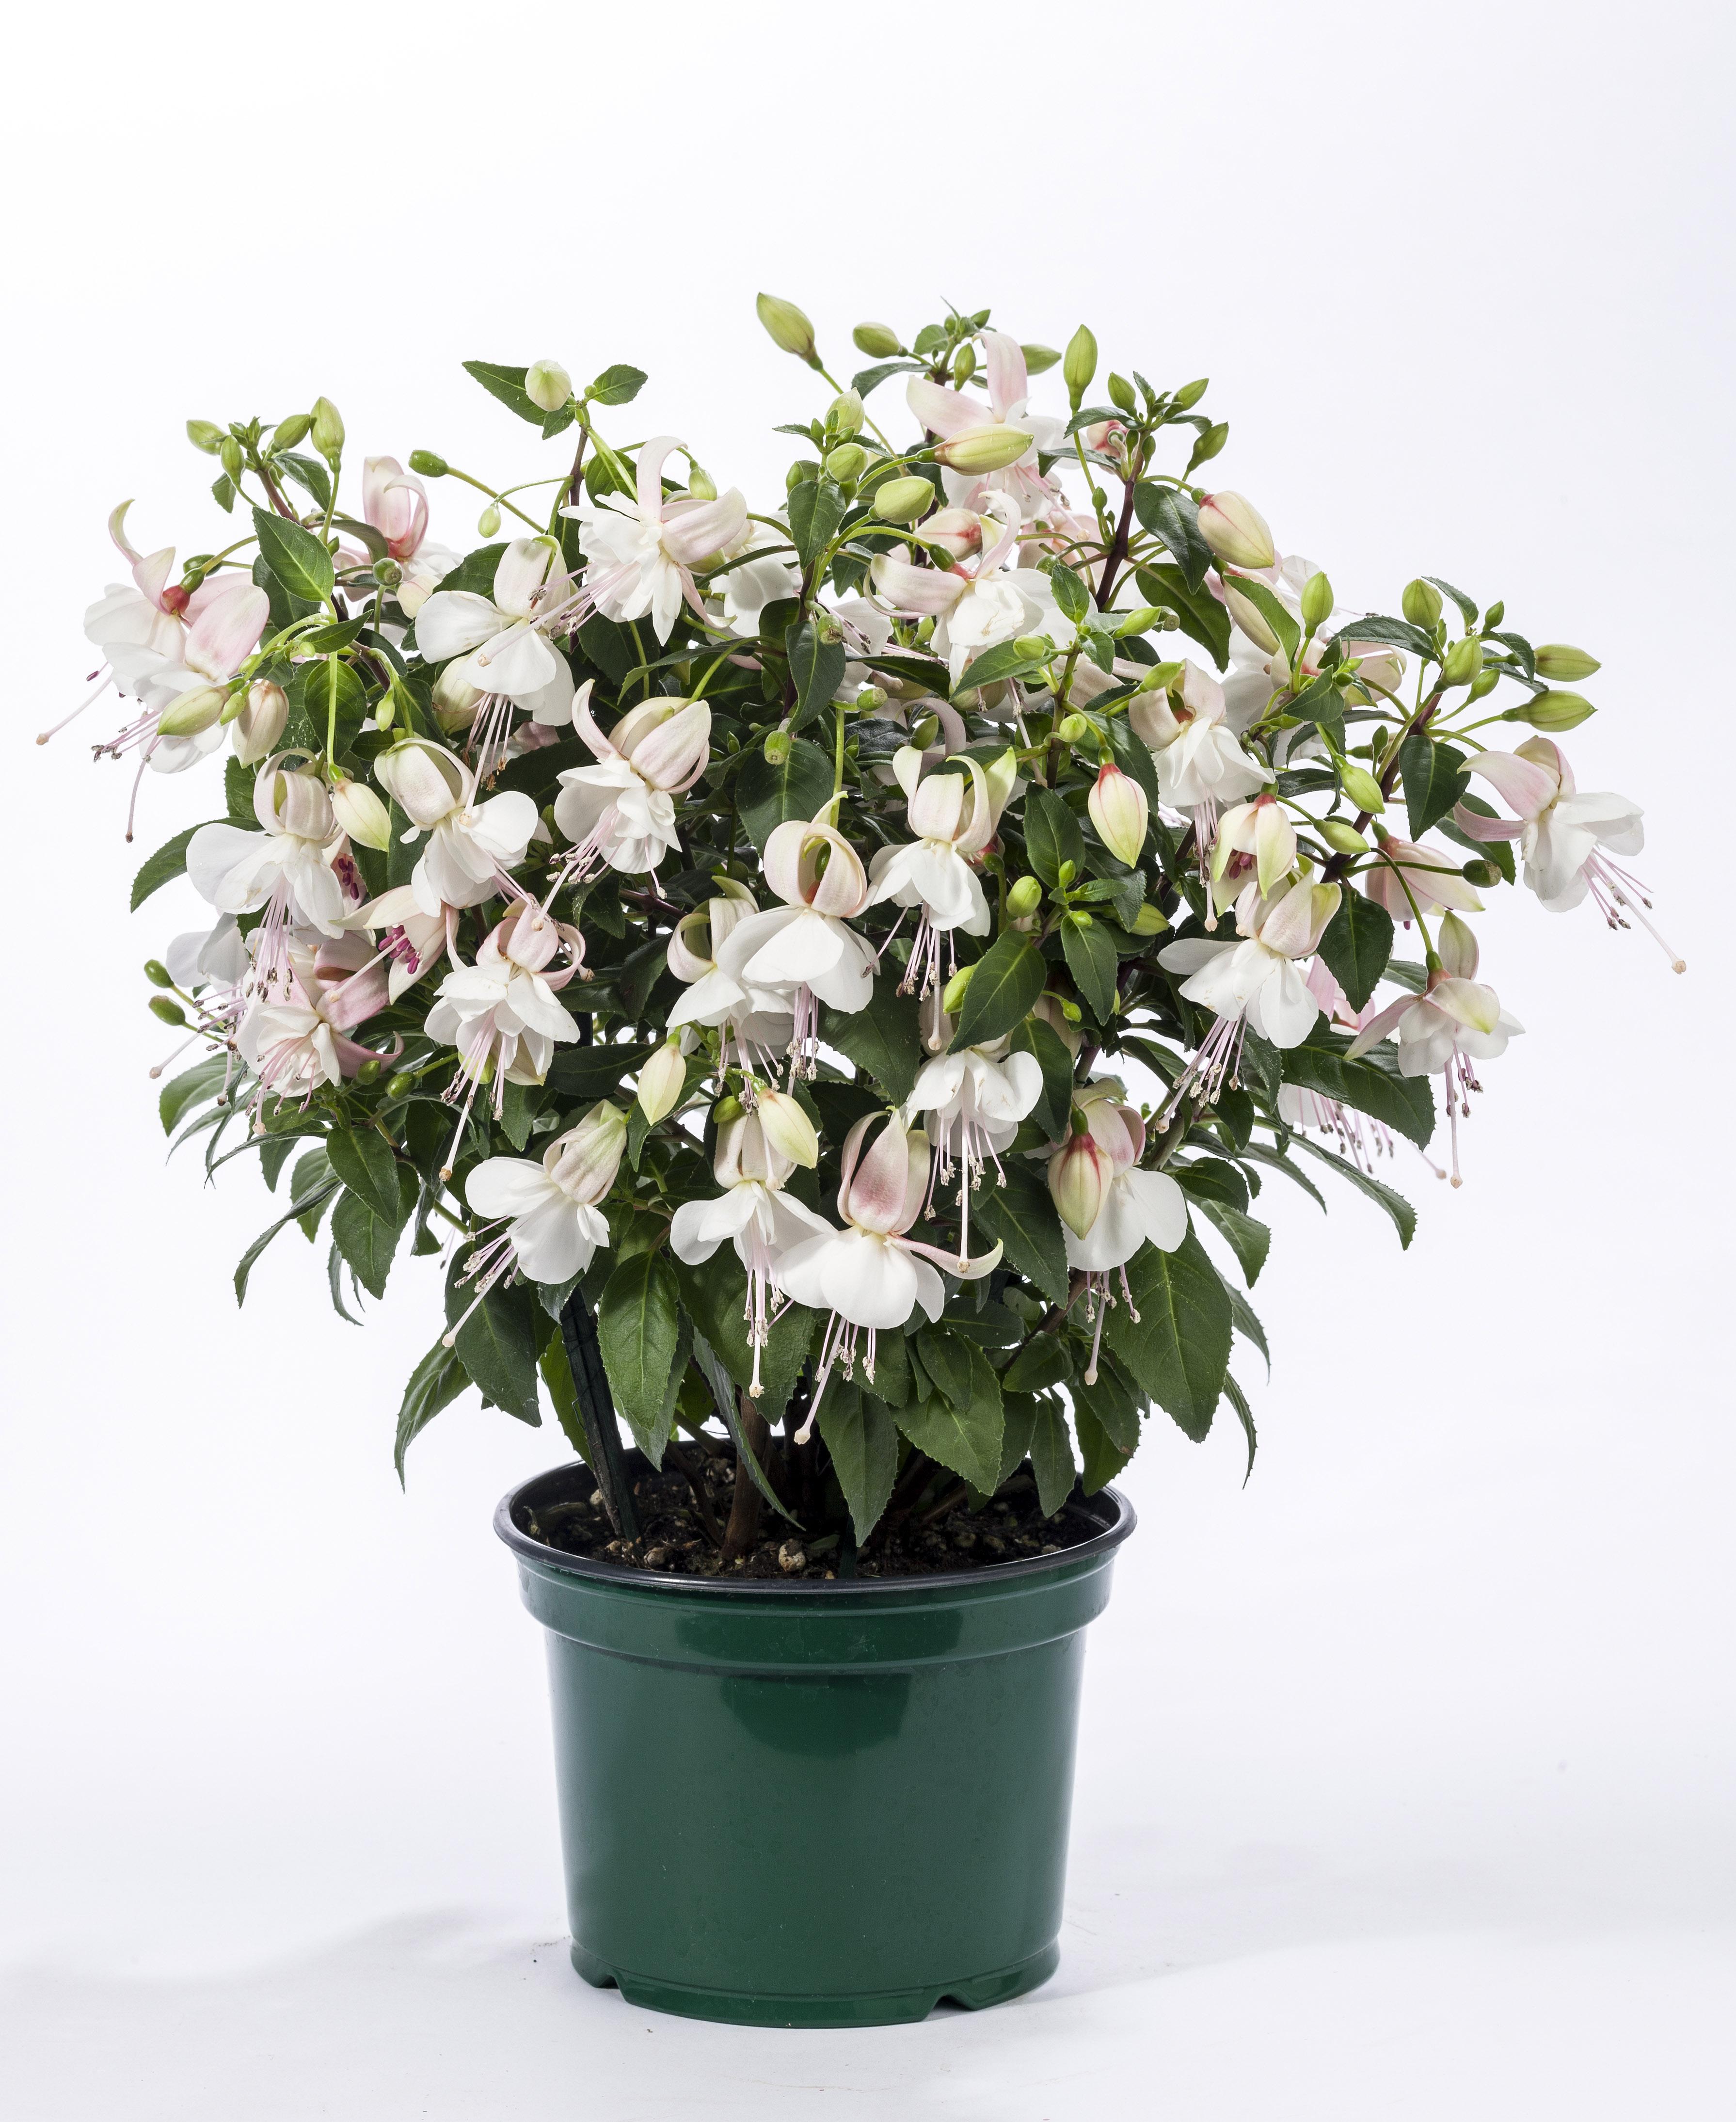 fuchsia hybrid charm white white compact charm chime series mail order plants buy now